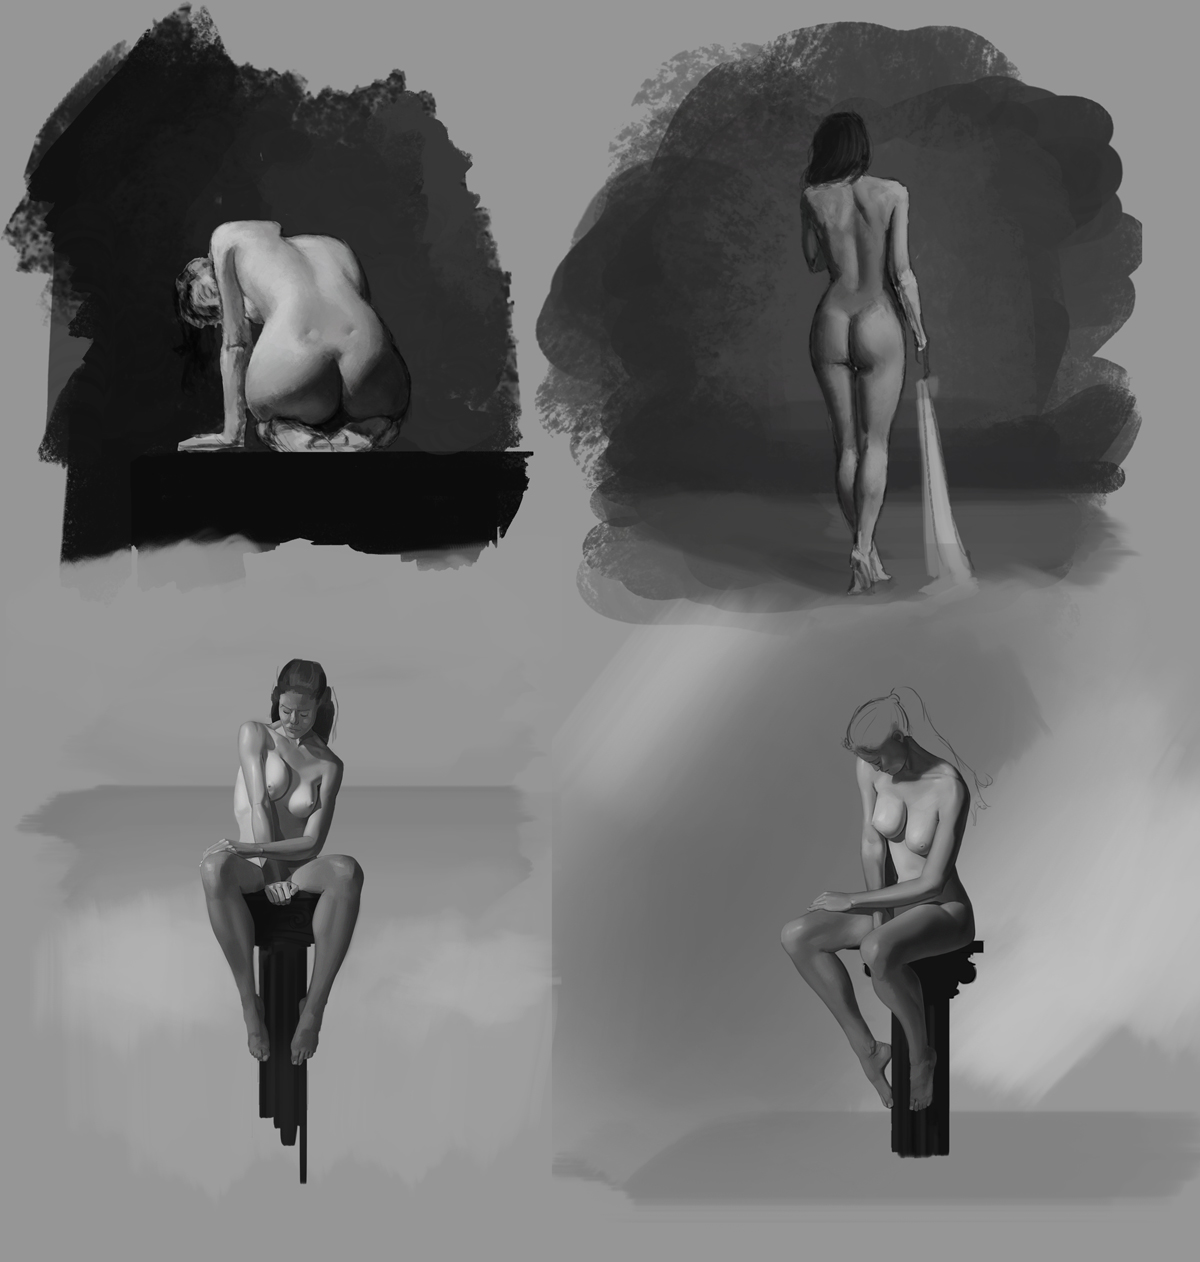 skin/anatomy studies